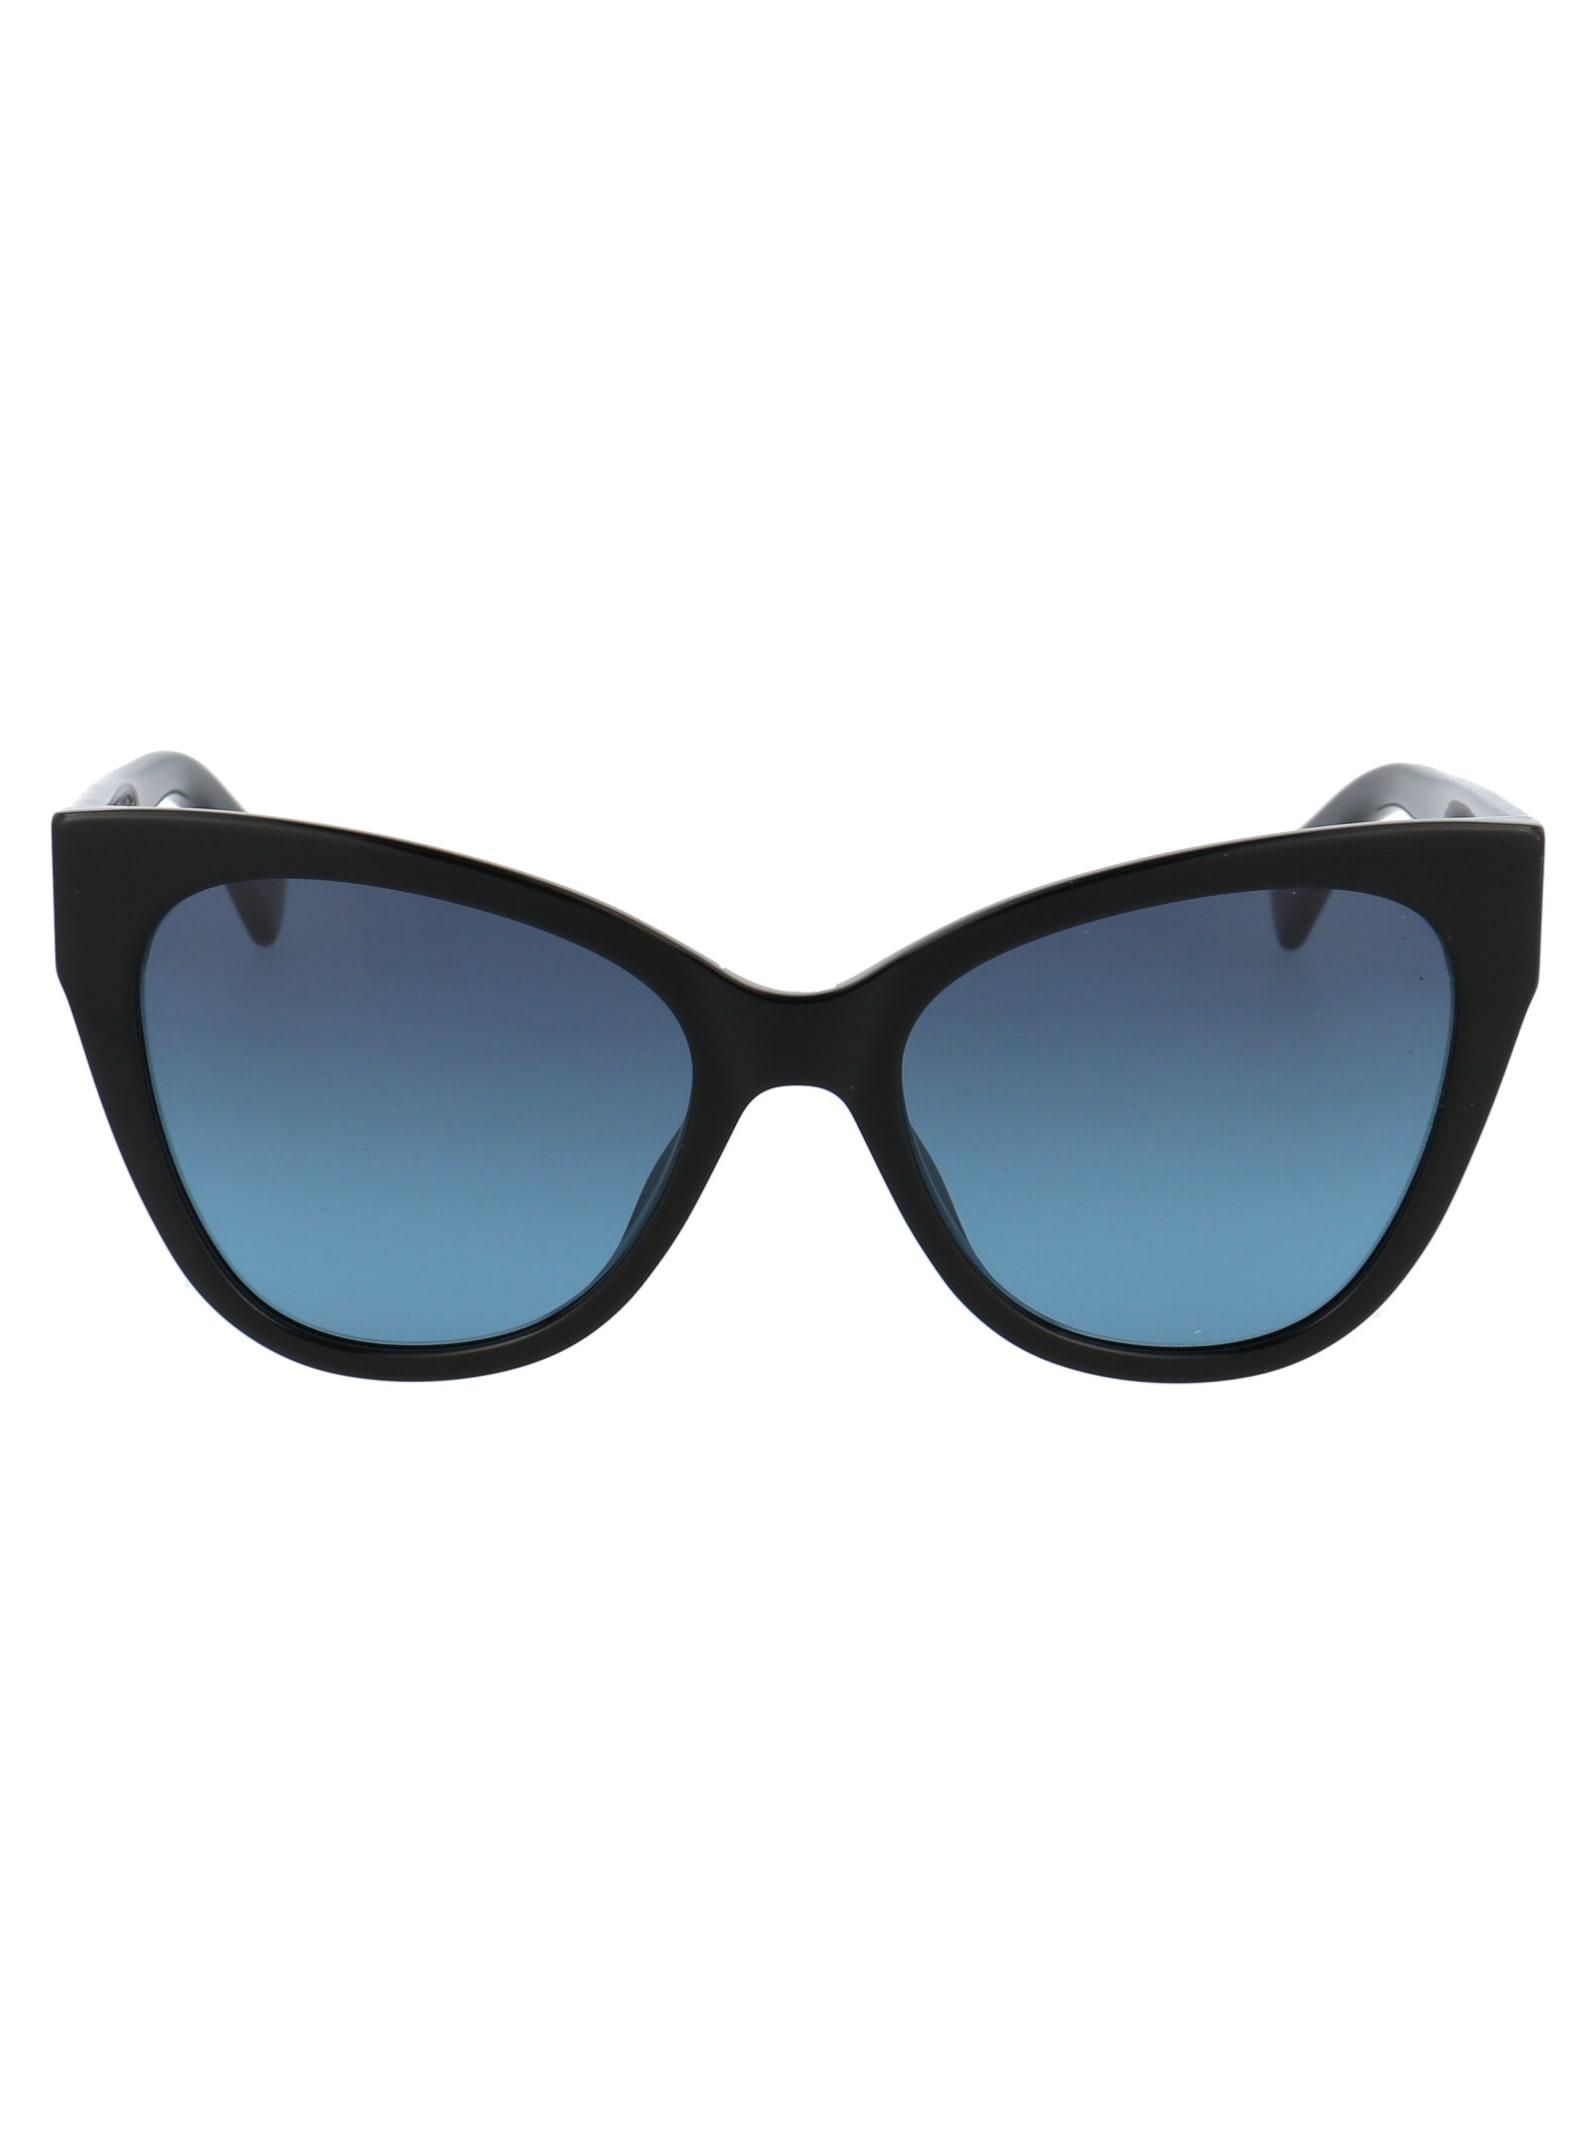 Mos056/s Sunglasses